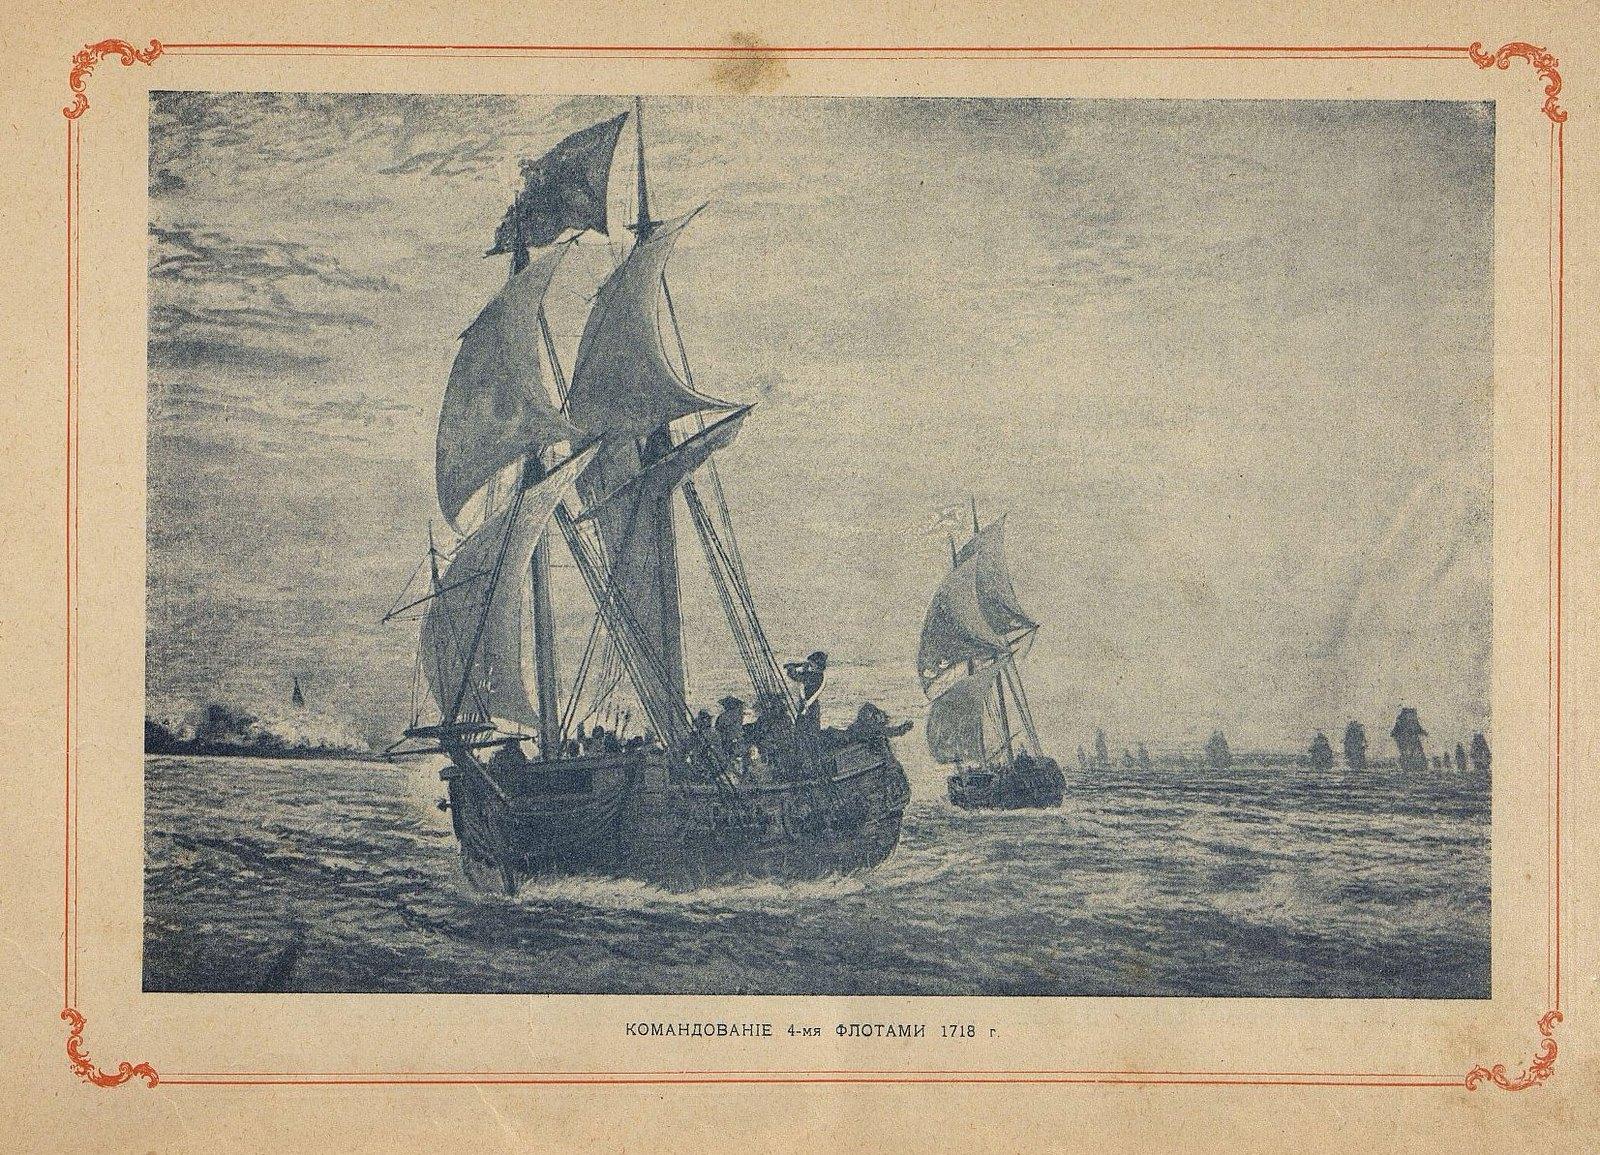 Командование 4-мя флотами 1718 г.